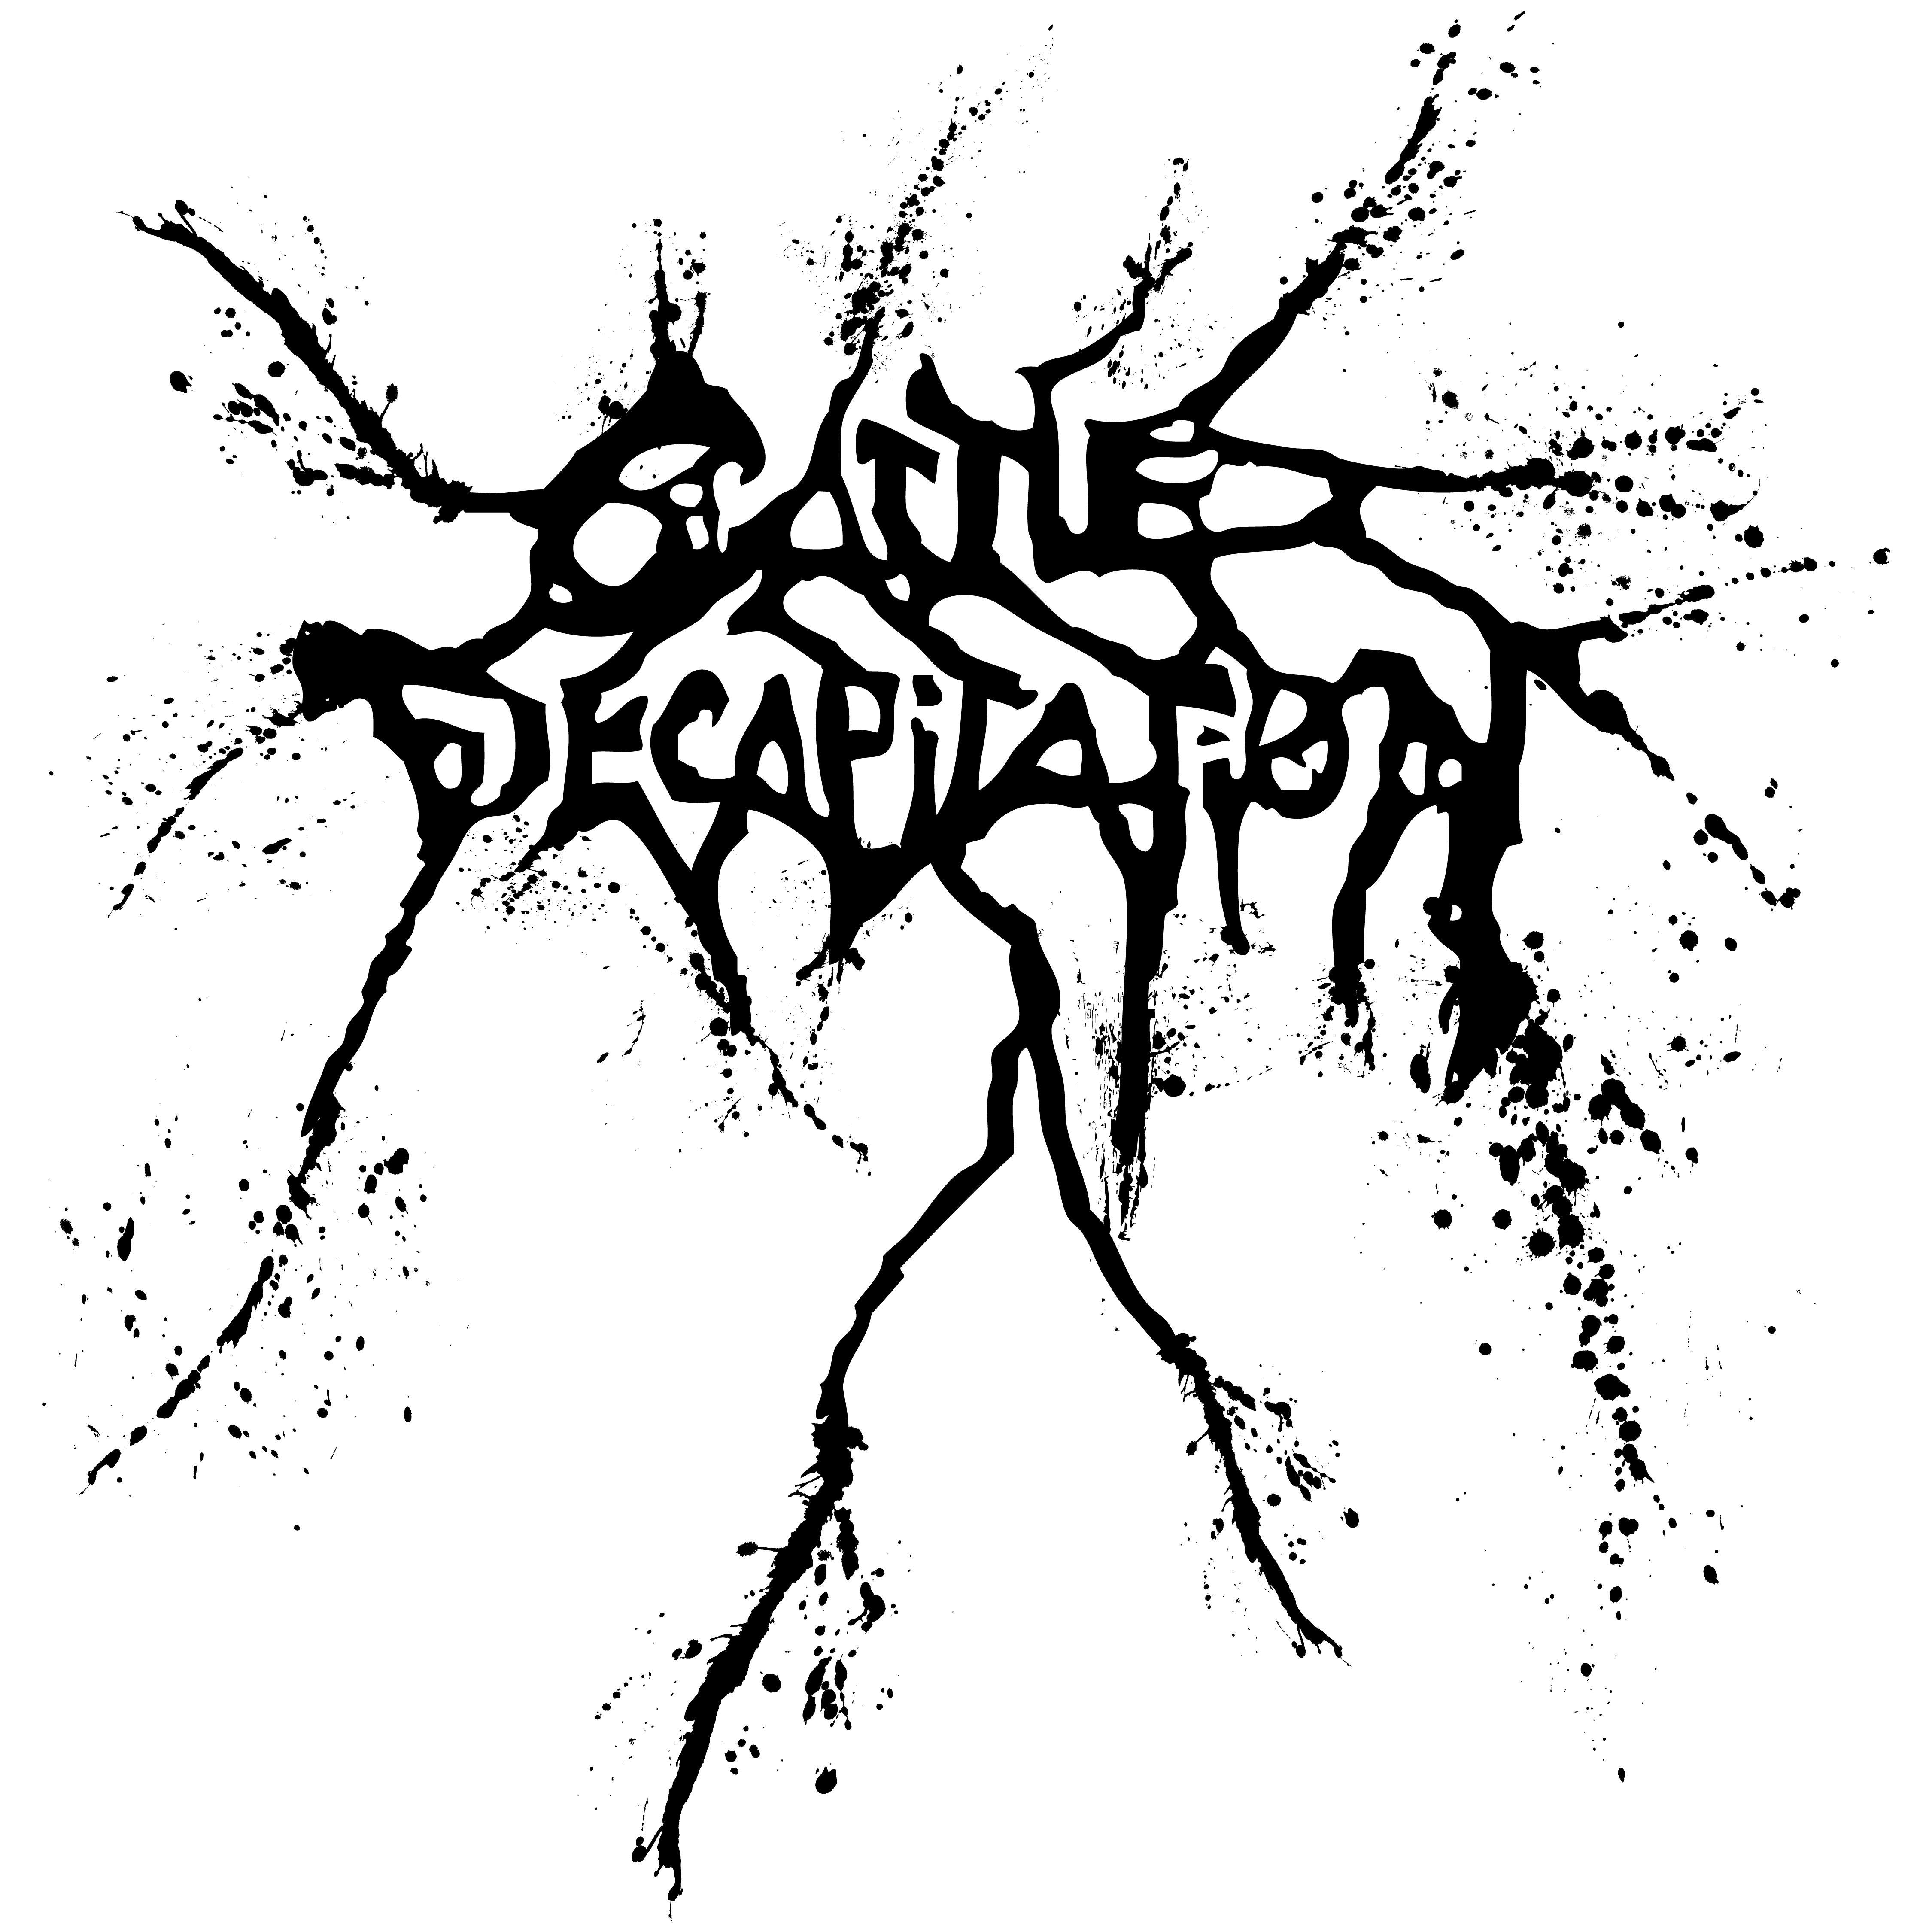 Cattle Decapition Cattle decapitation, Art design